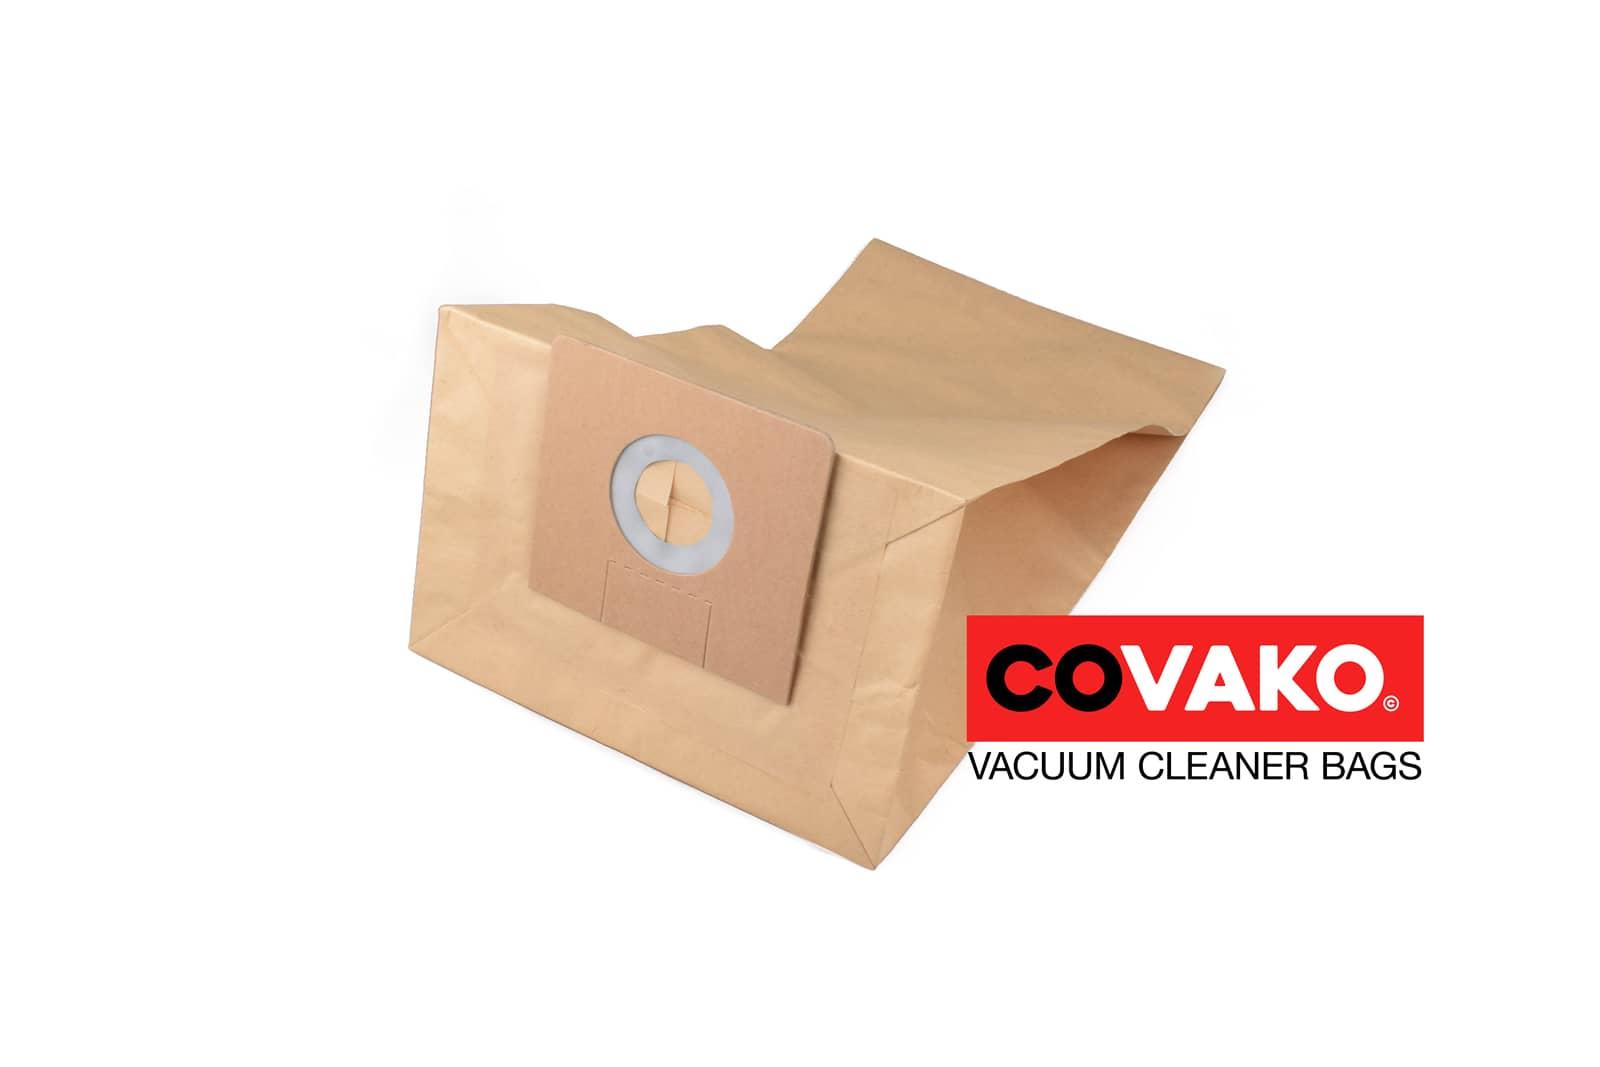 Kärcher NT 351 eco / Paper - Kärcher vacuum cleaner bags